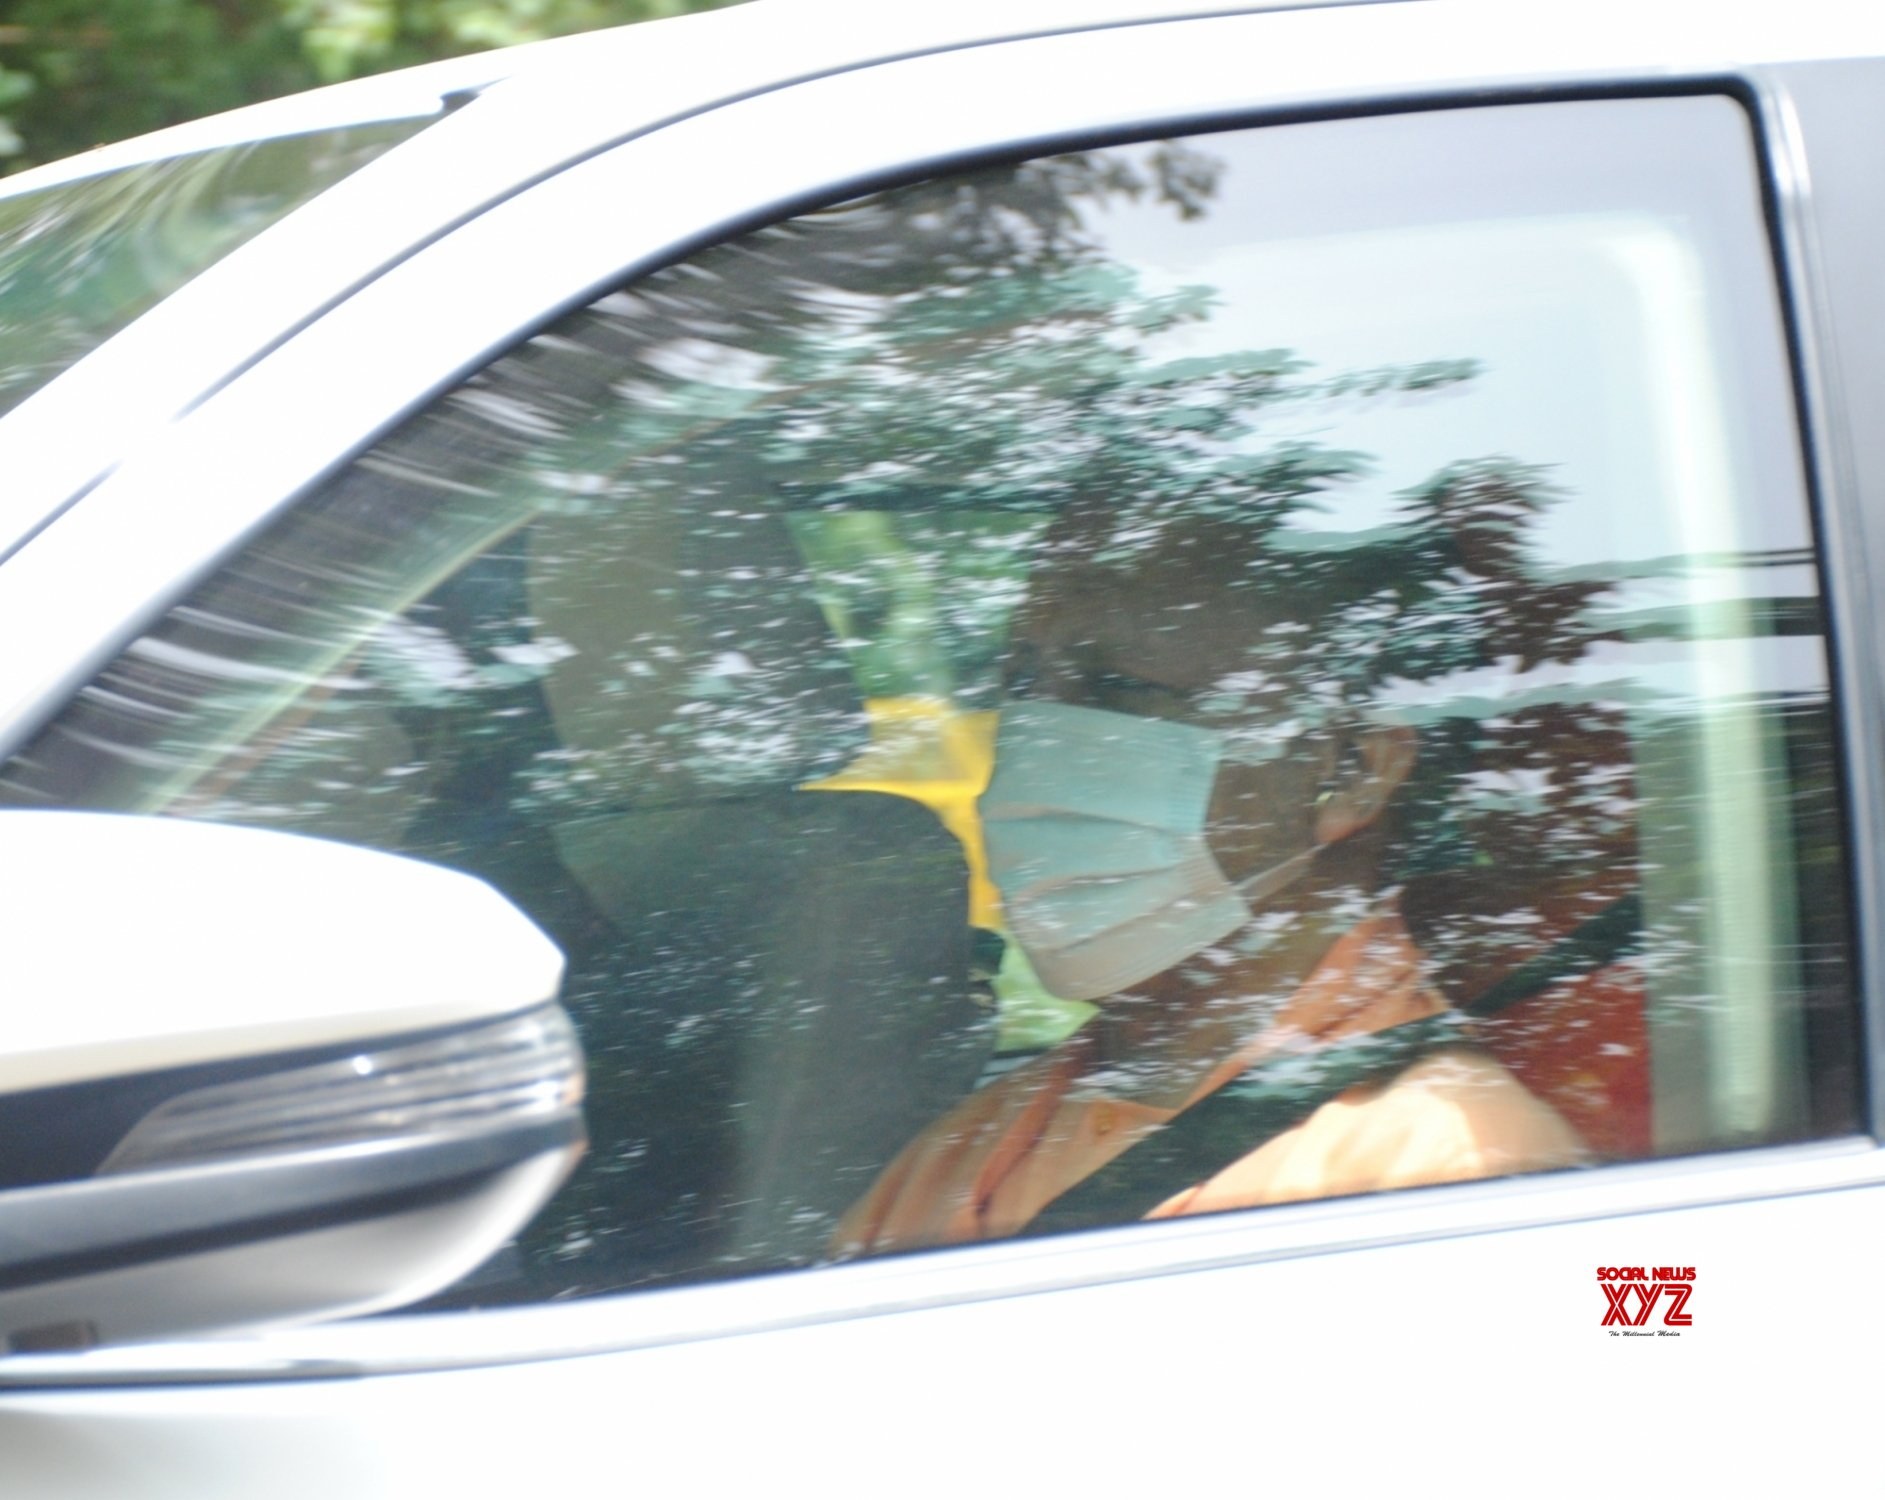 New Delhi: Uttar Pradesh chief minister Yogi Adityanath coming out after meeting with BJP president JP Nadda in New Delhi. #Gallery